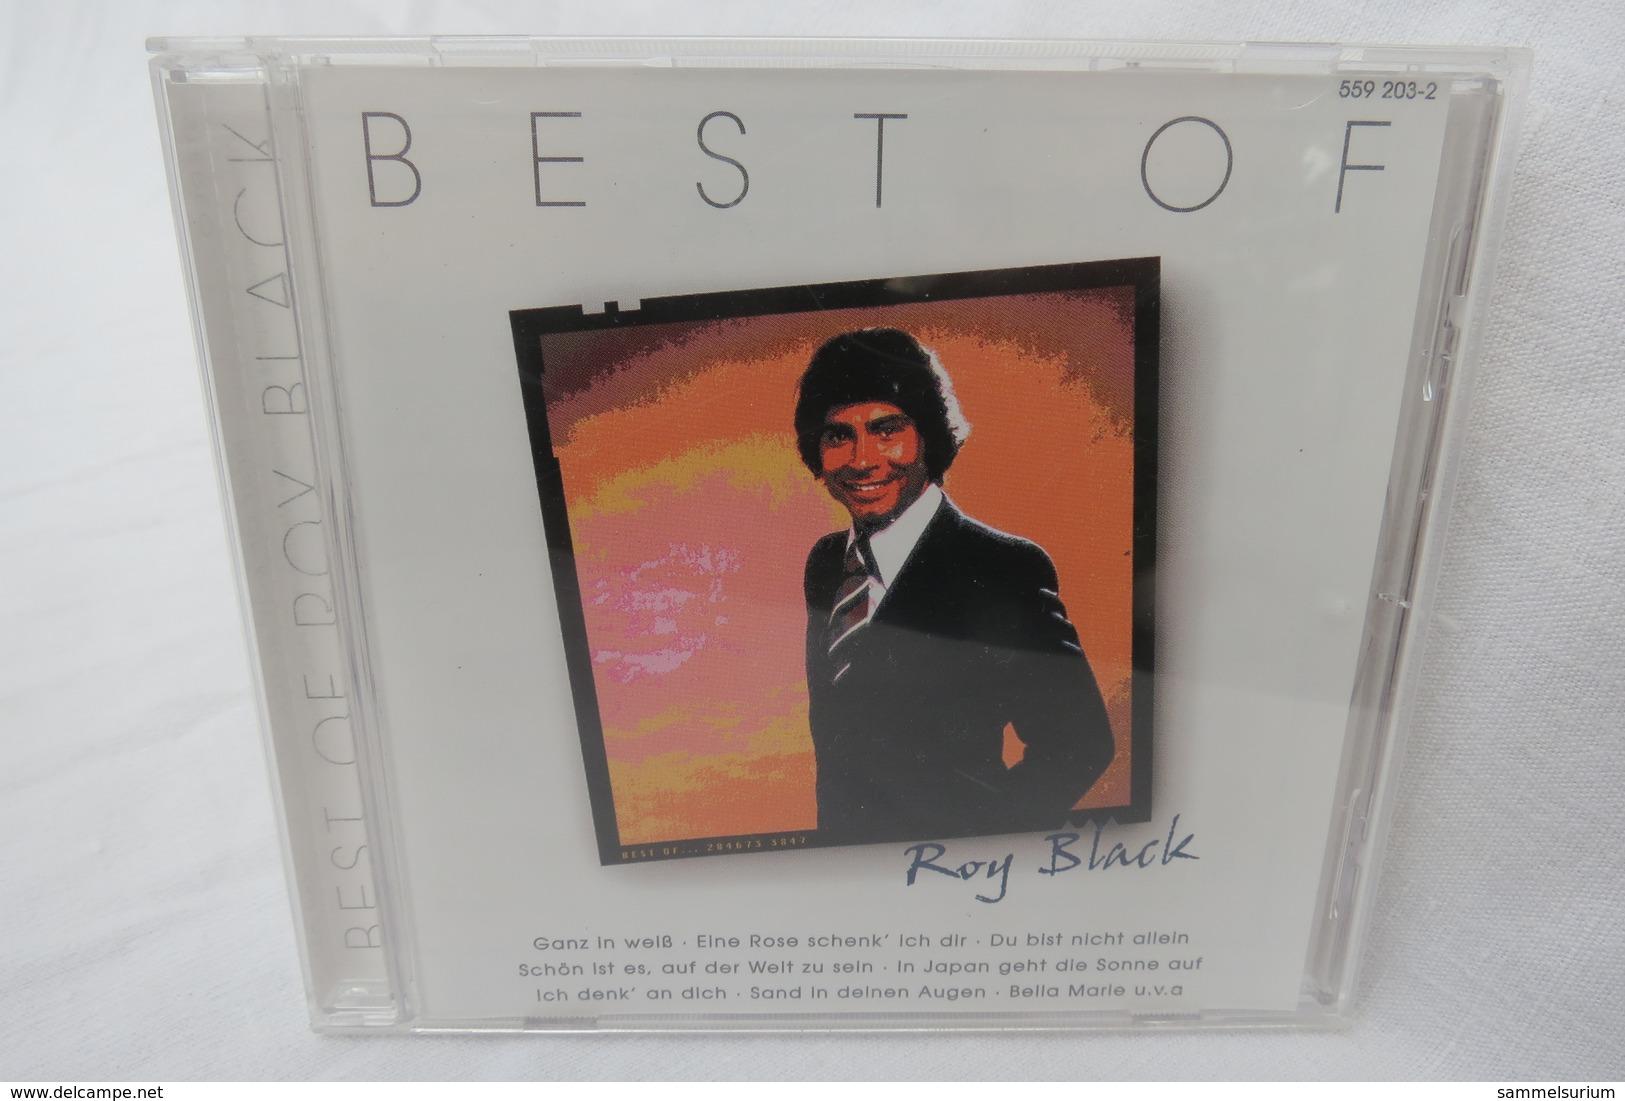 "CD ""Roy Black"" Best Of - Sonstige - Deutsche Musik"